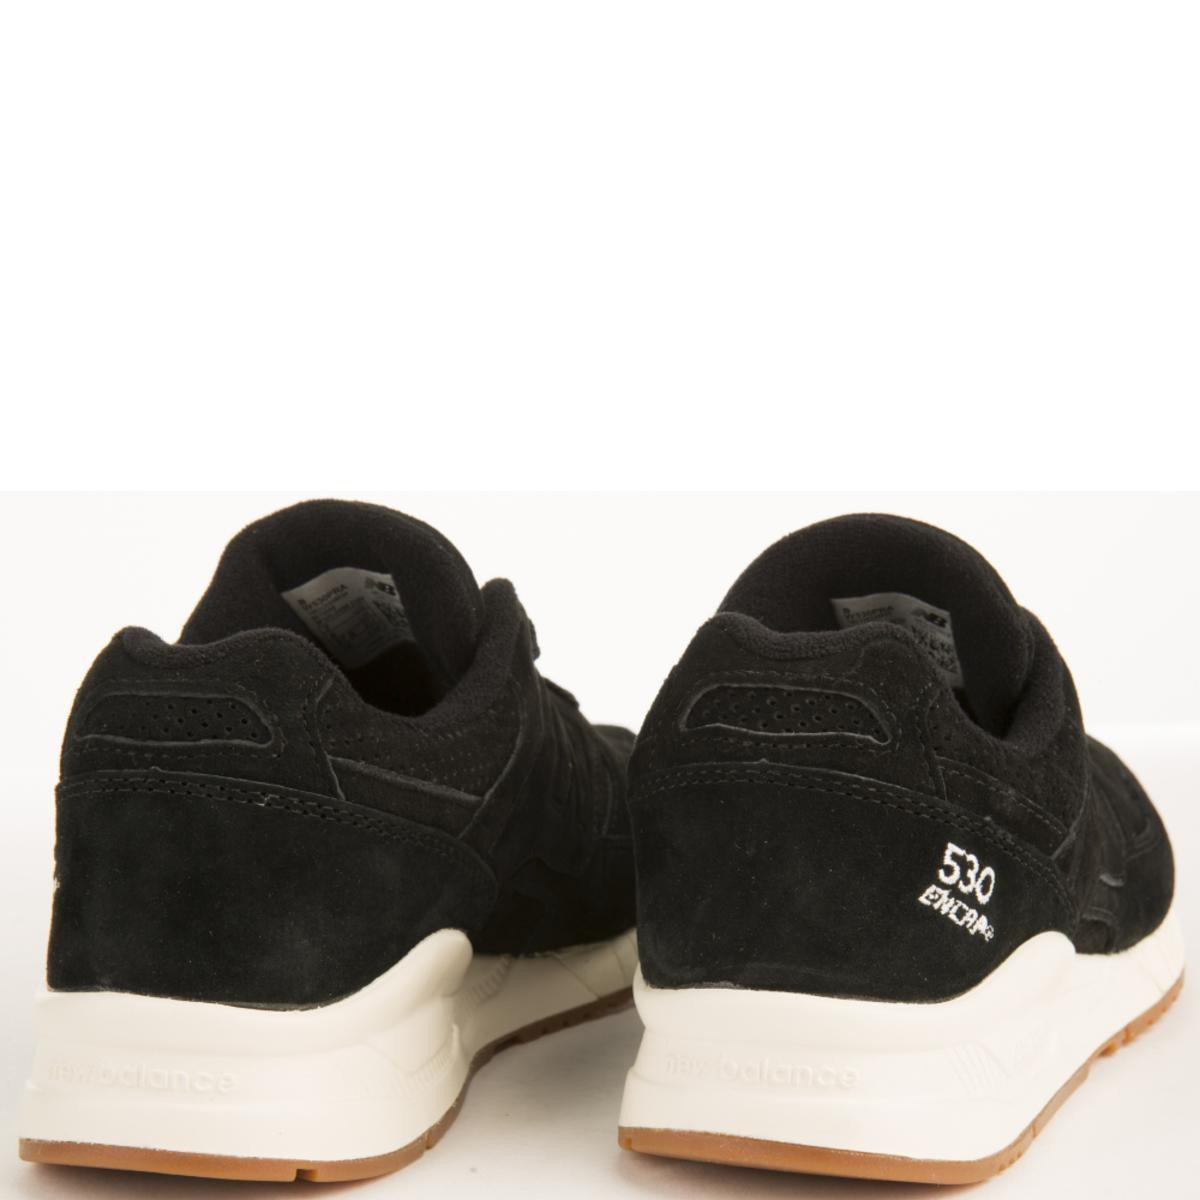 online retailer 2f6da 827d8 New Balance - 530 Lux Black Suede Sneakers - Lyst. View fullscreen